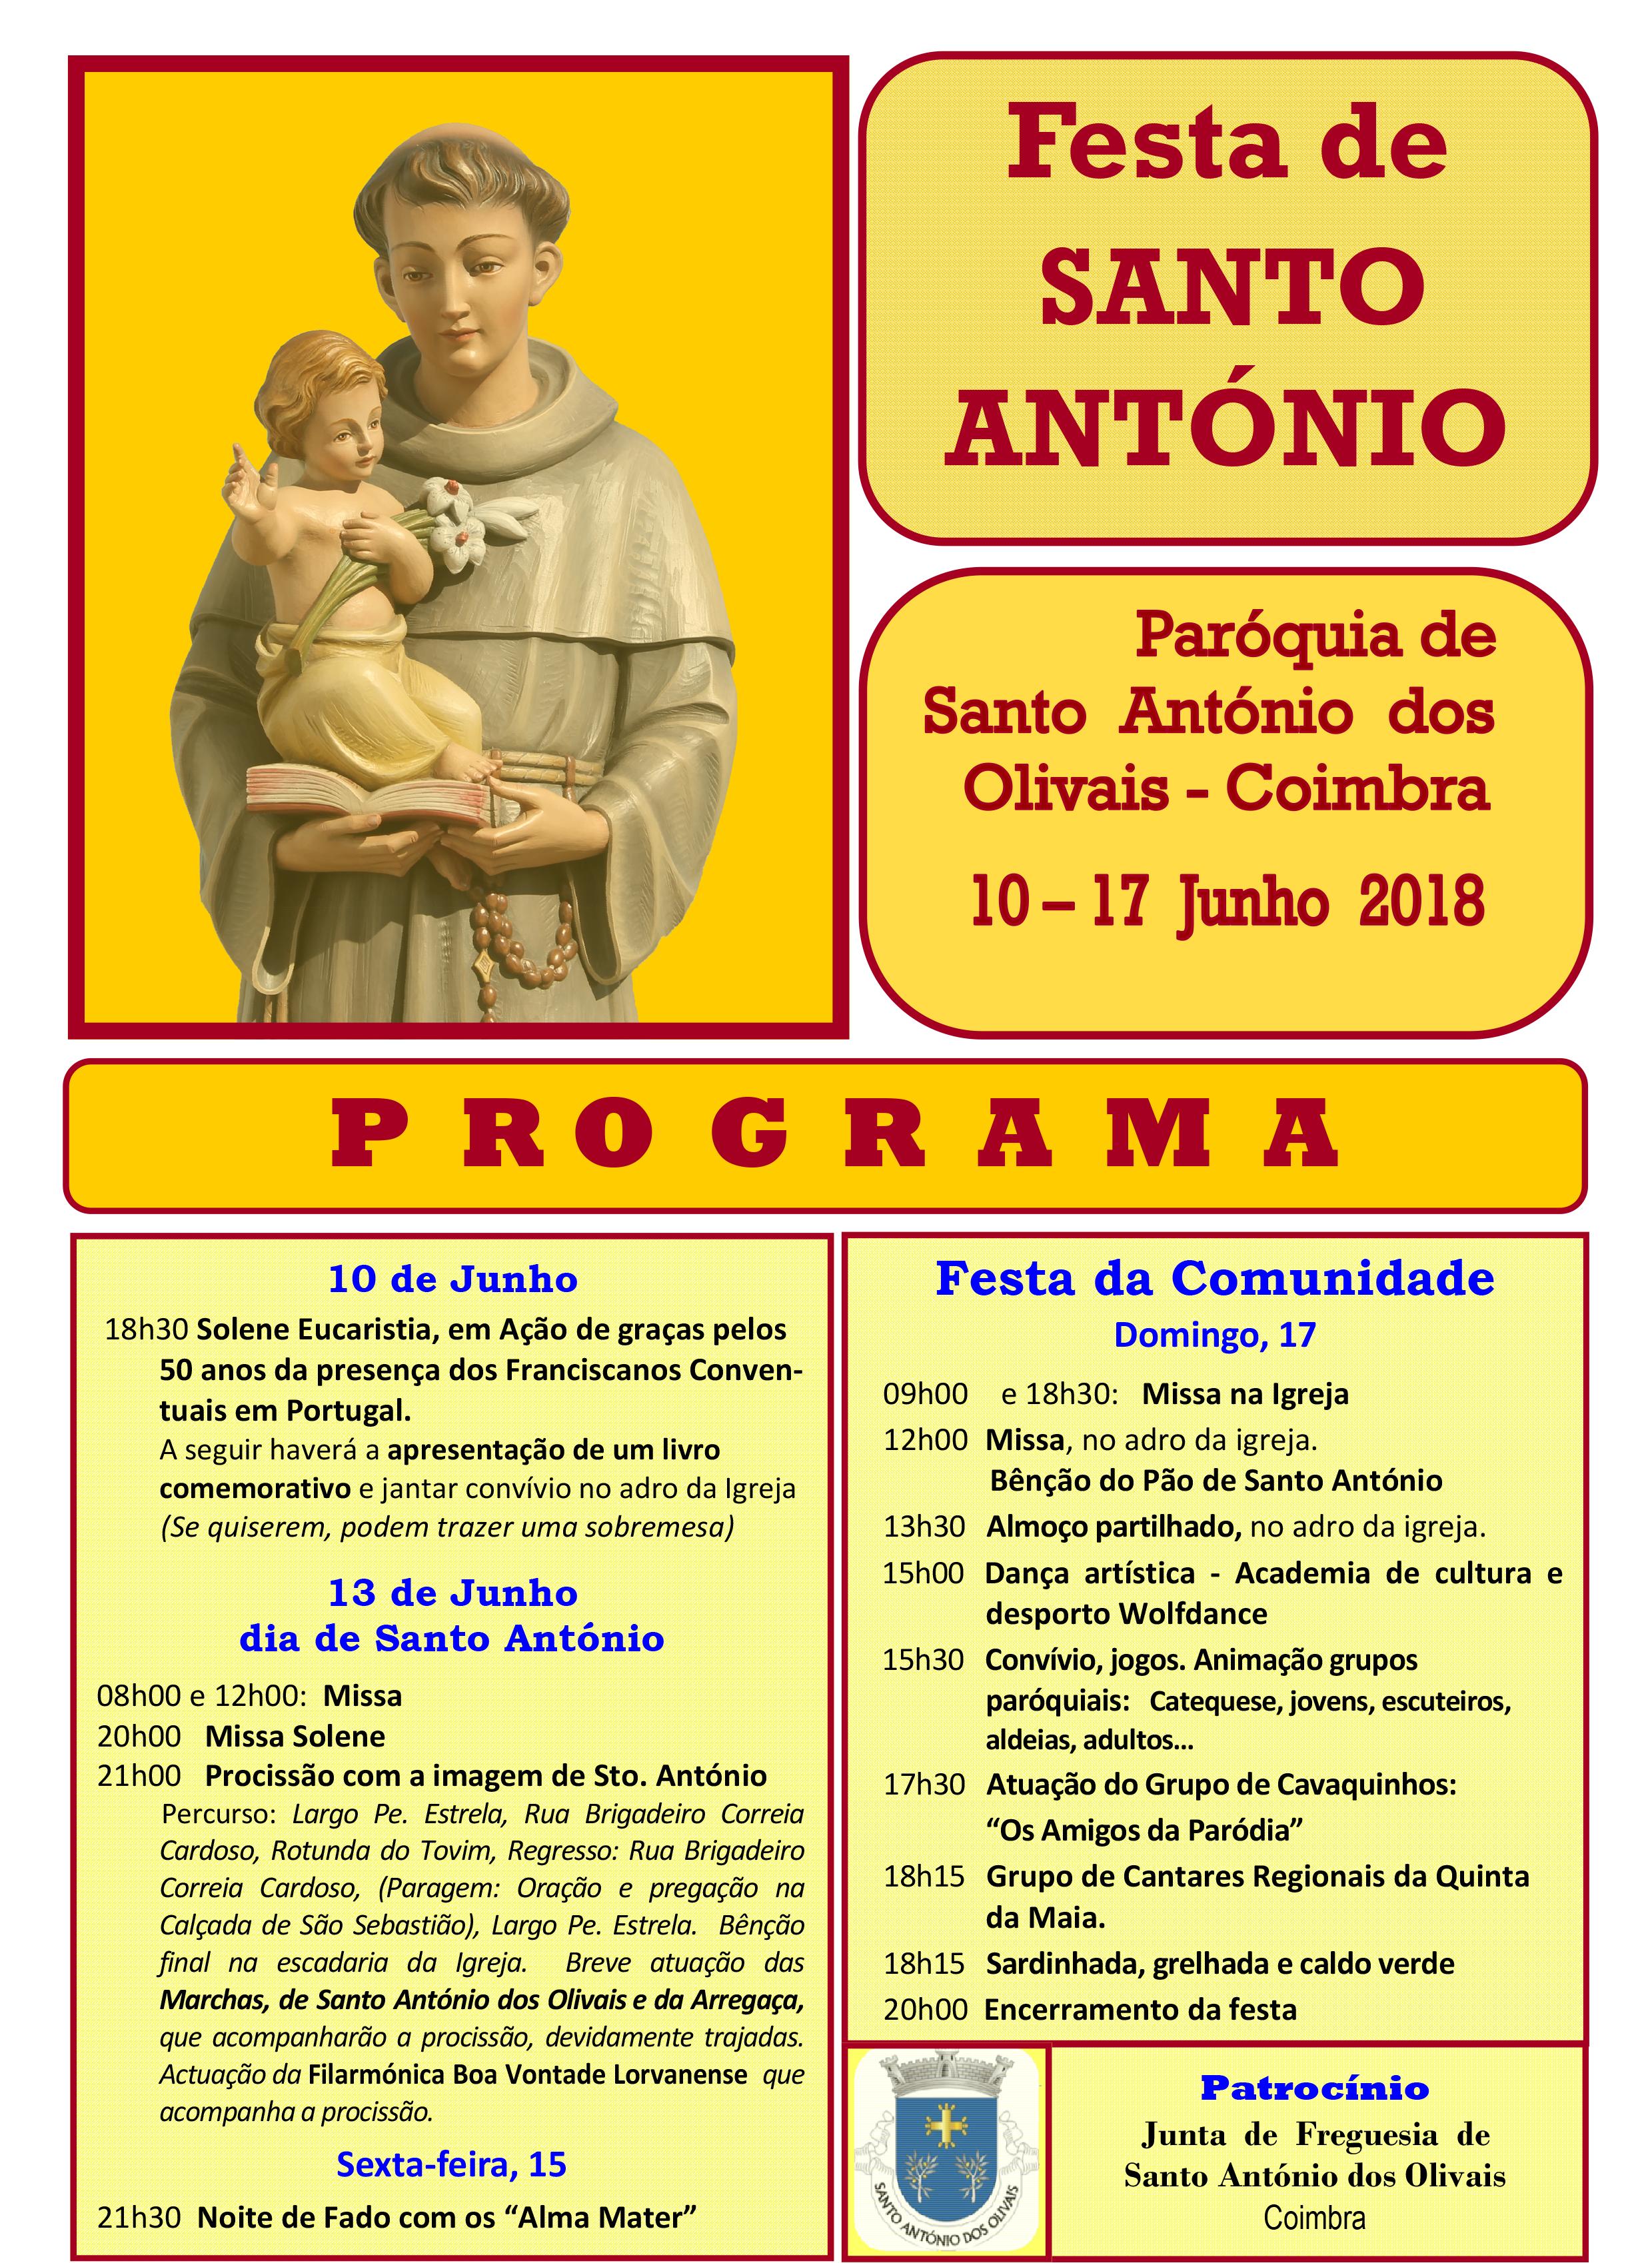 FESTAS RELIGIOSOS DE SANTO ANTÓNIO